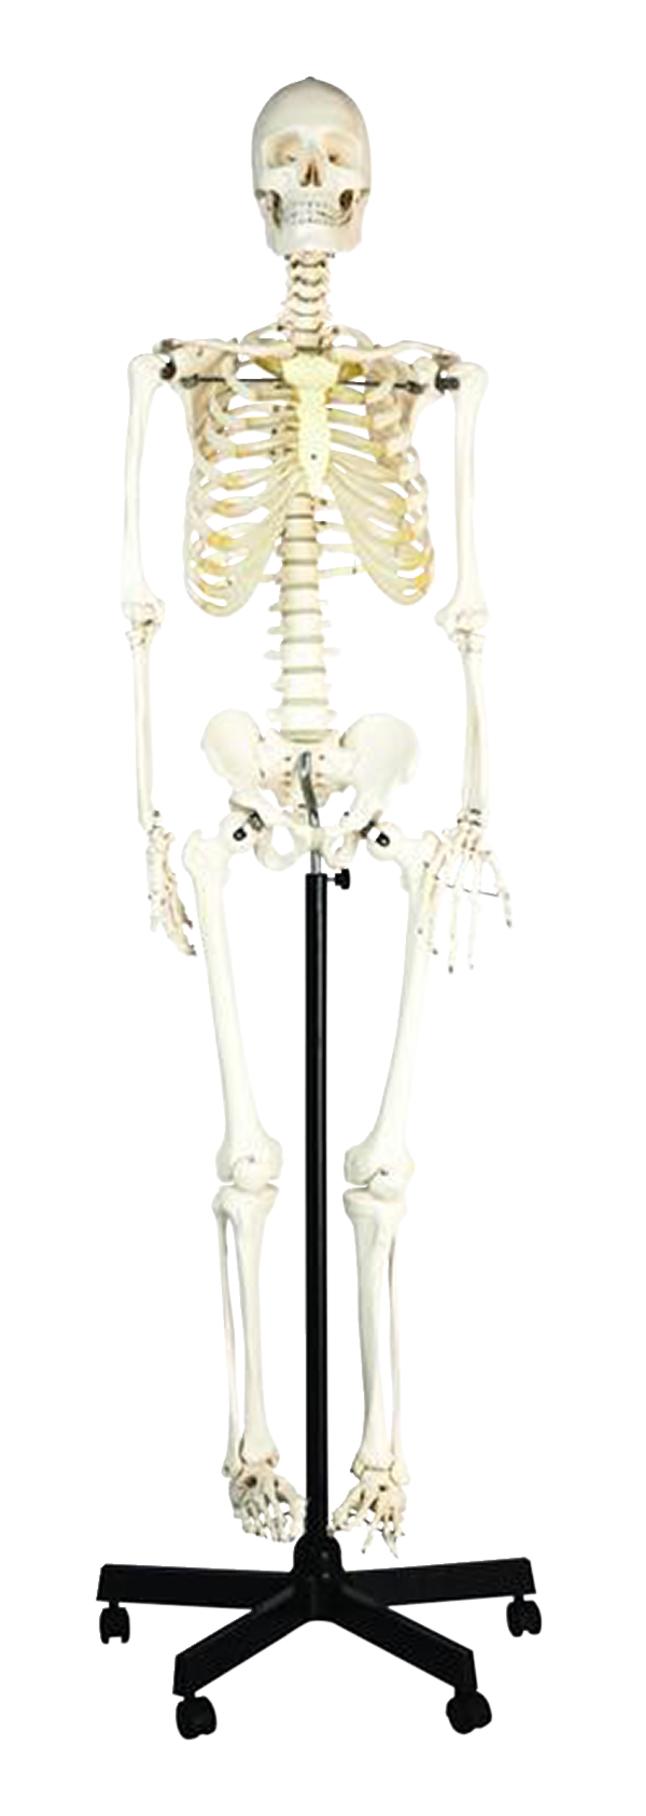 Lab and Anatomical Models, Item Number 1457400